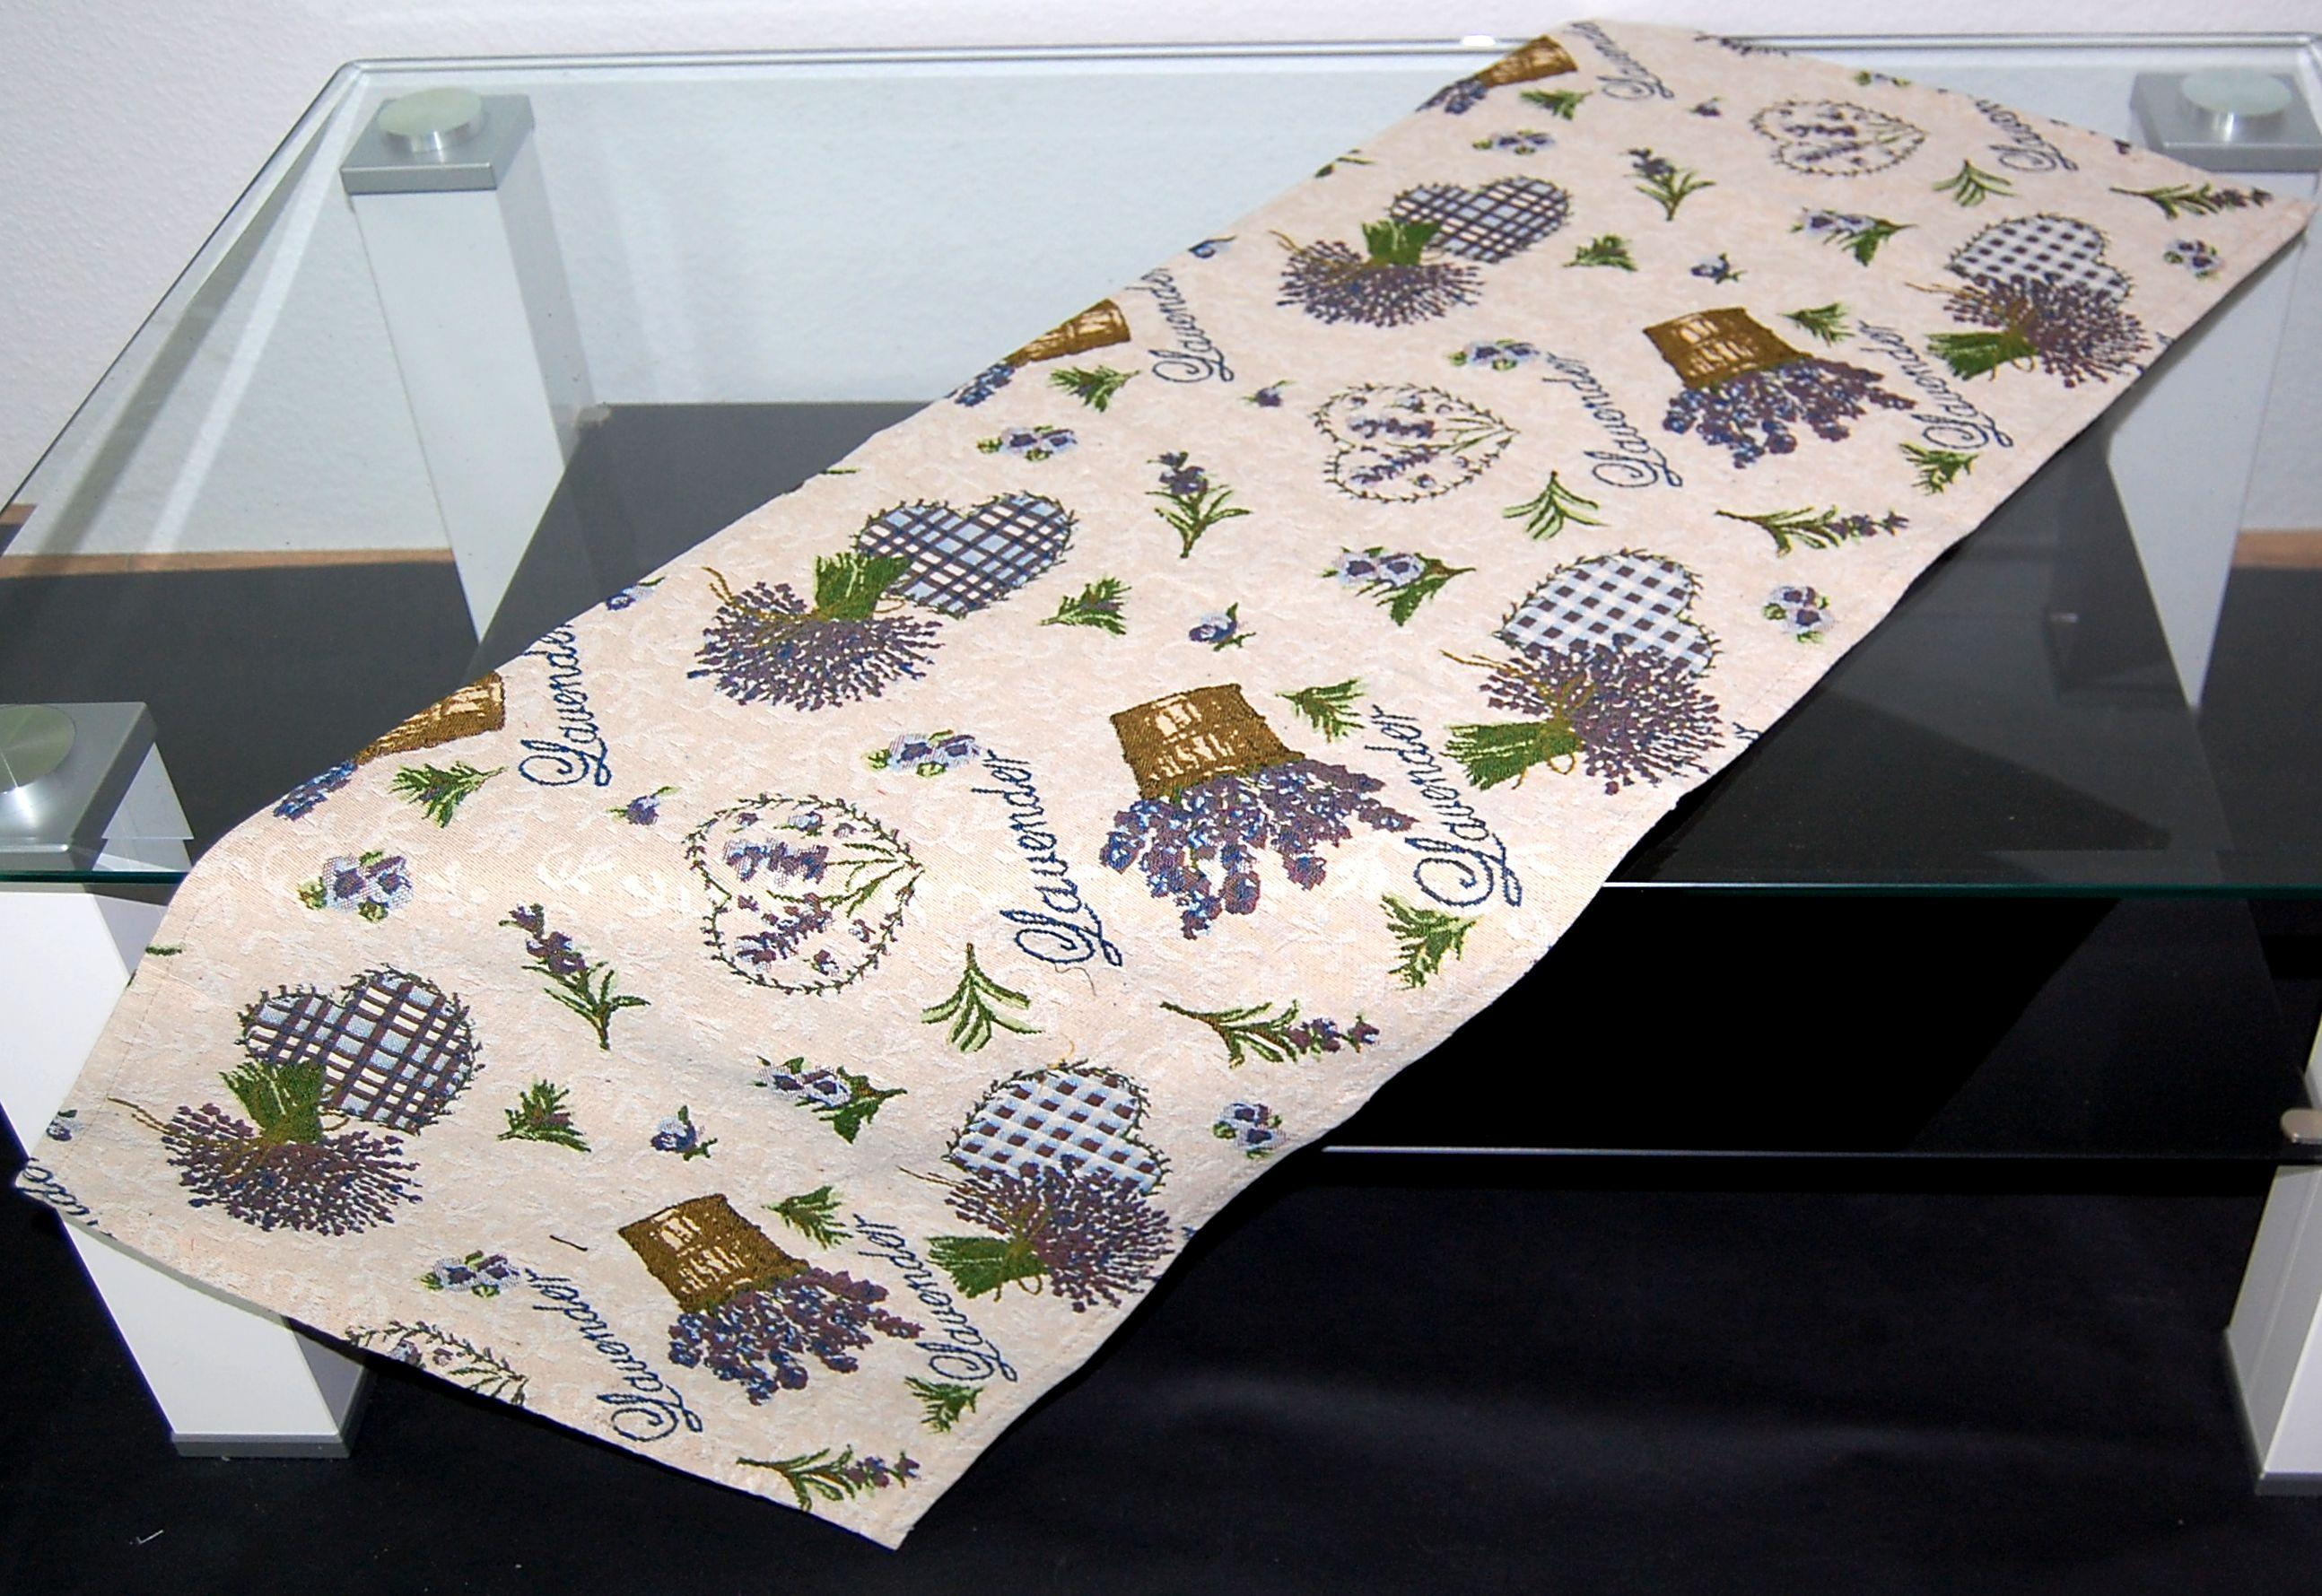 tischdecke gobelin tischl ufer mitteldecke lavendel. Black Bedroom Furniture Sets. Home Design Ideas